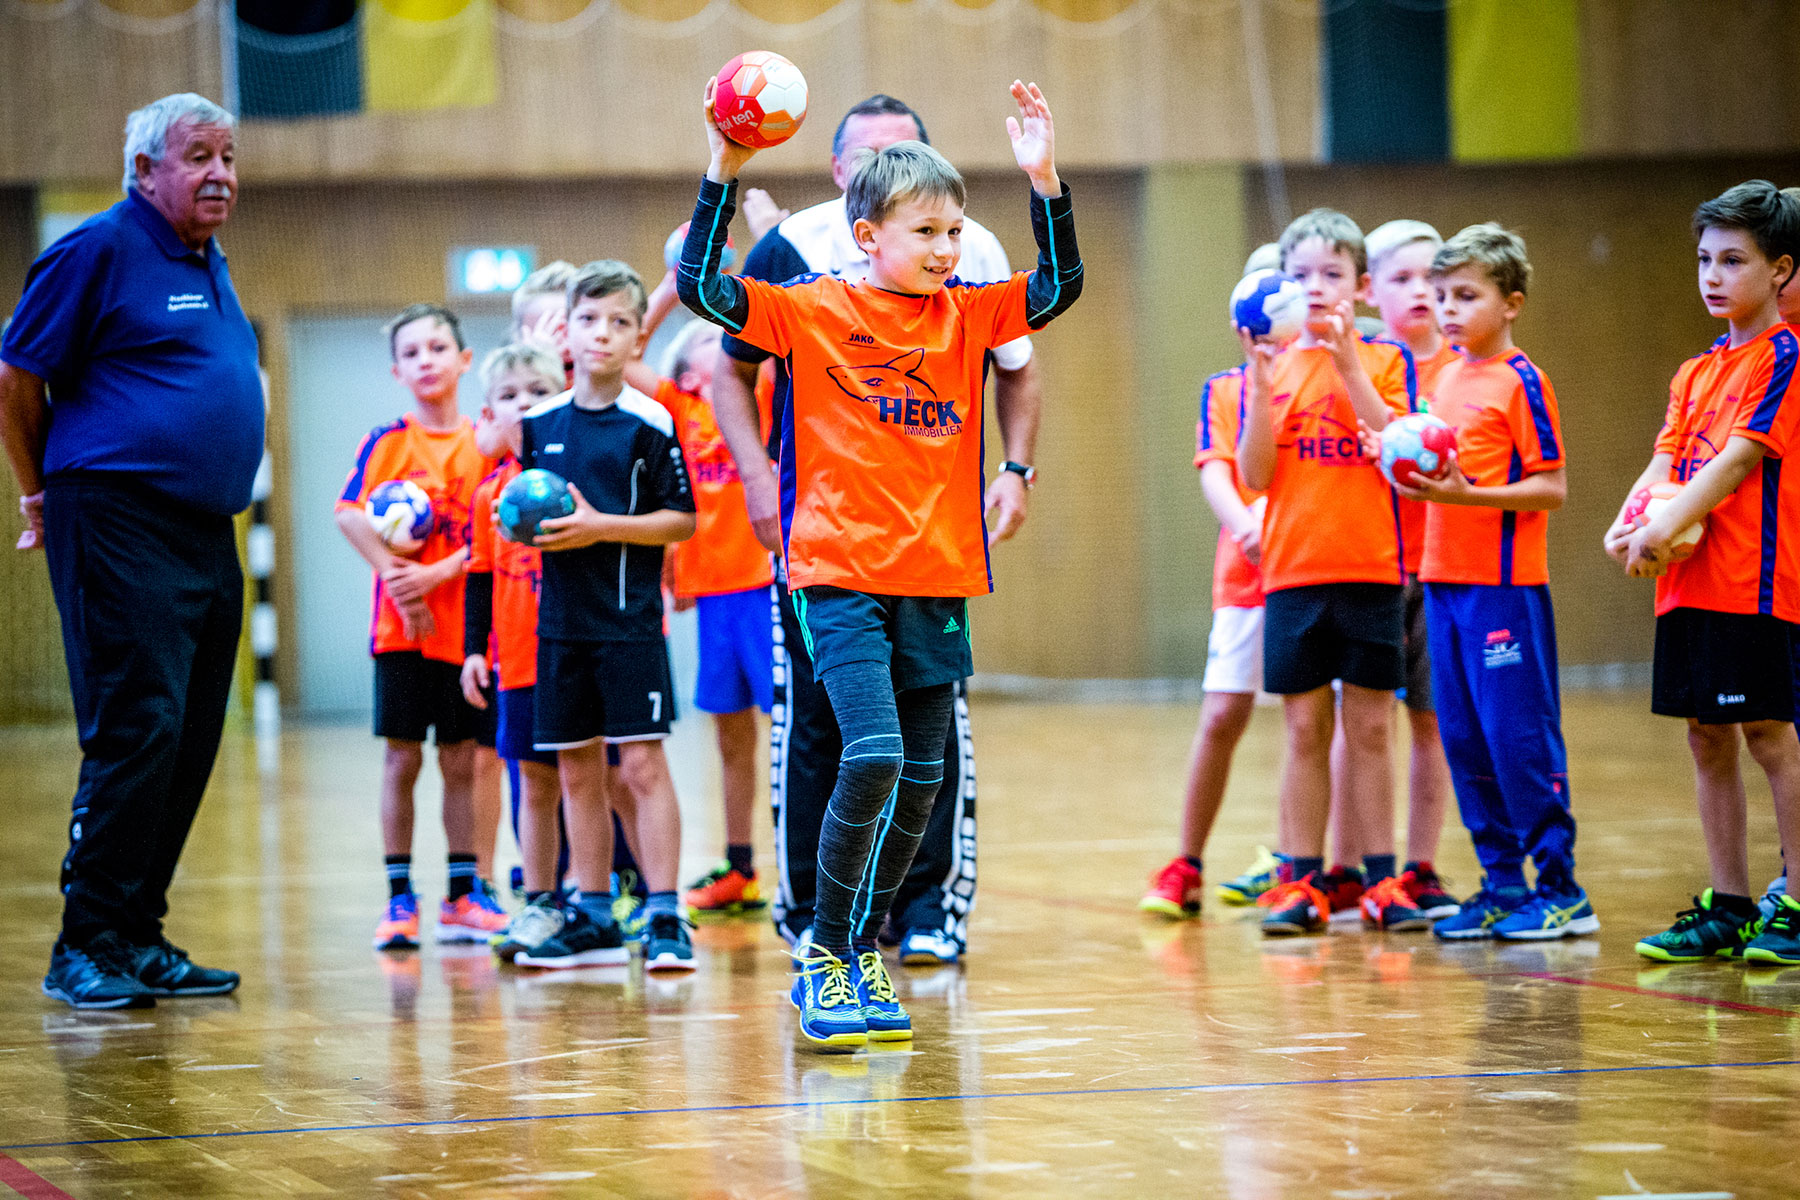 201809_Handballcamp_NDH (14)